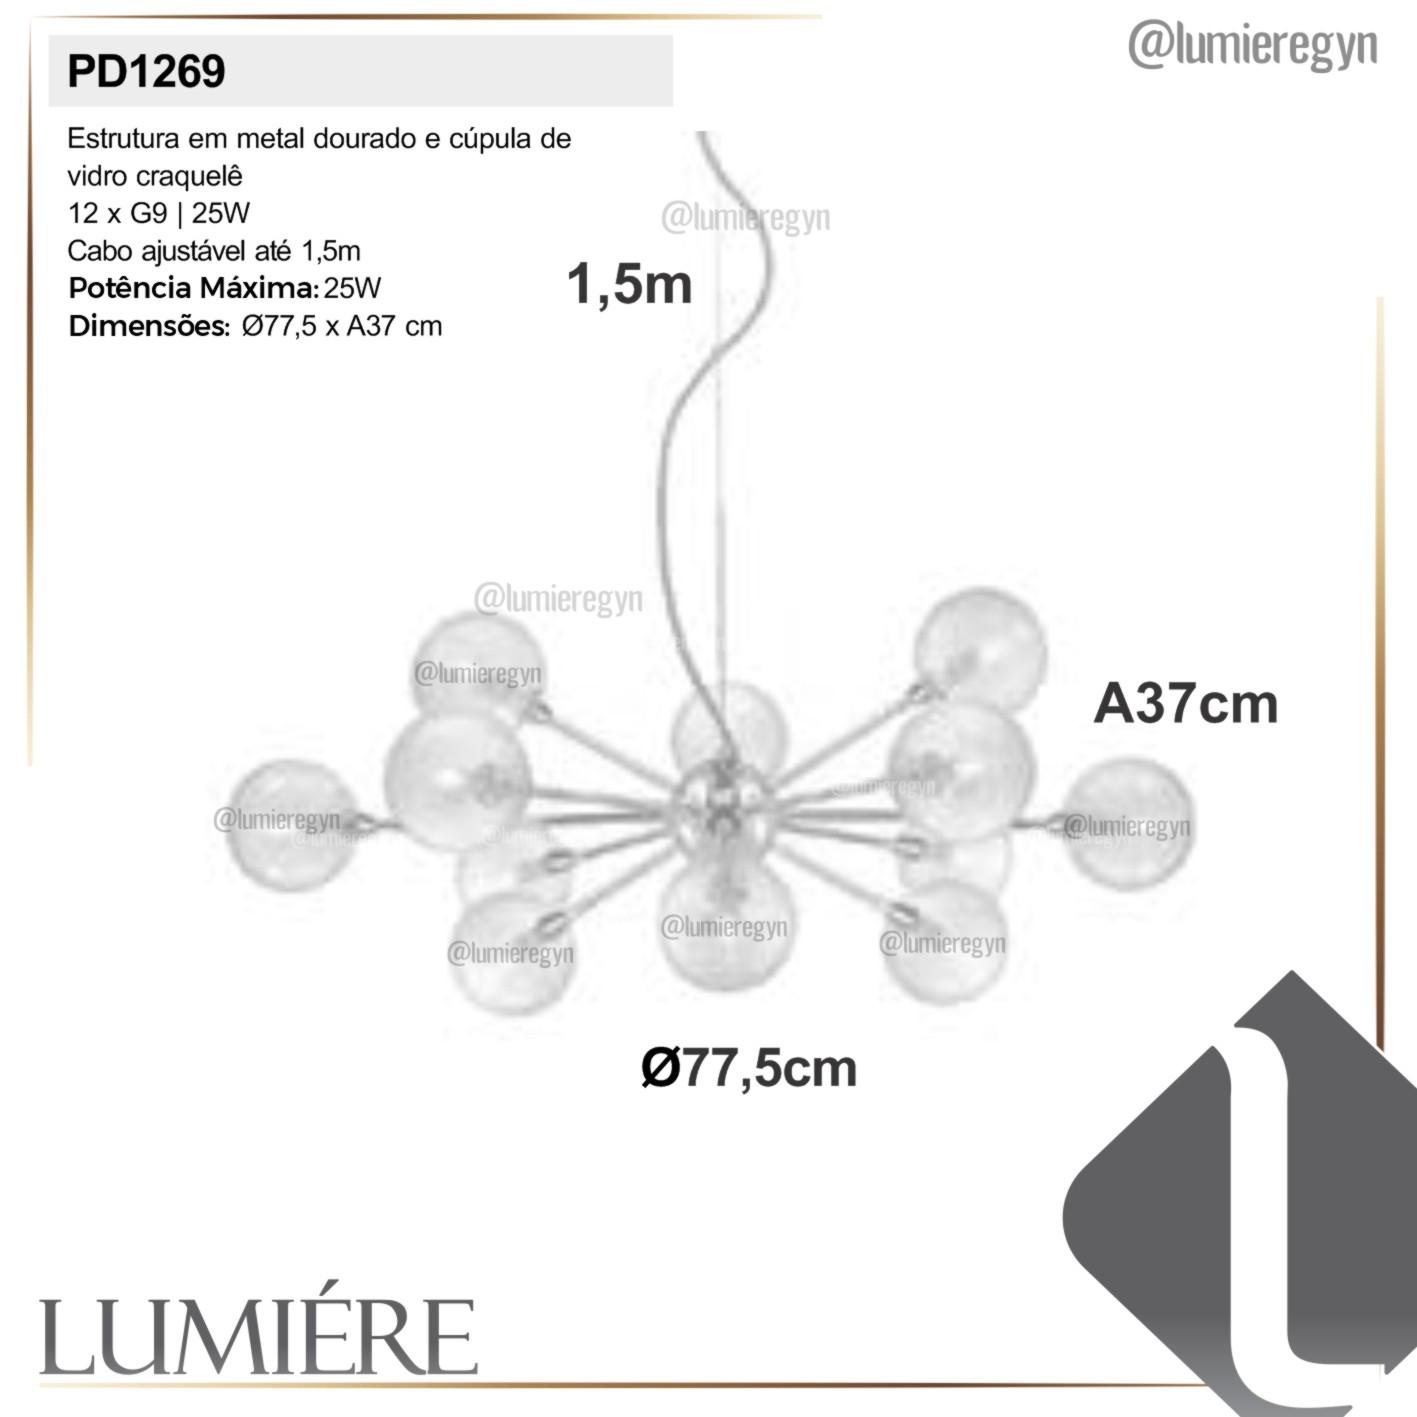 Pendente Quality PD1269 Atomy 12L G9 Ø775x370mm Dourado